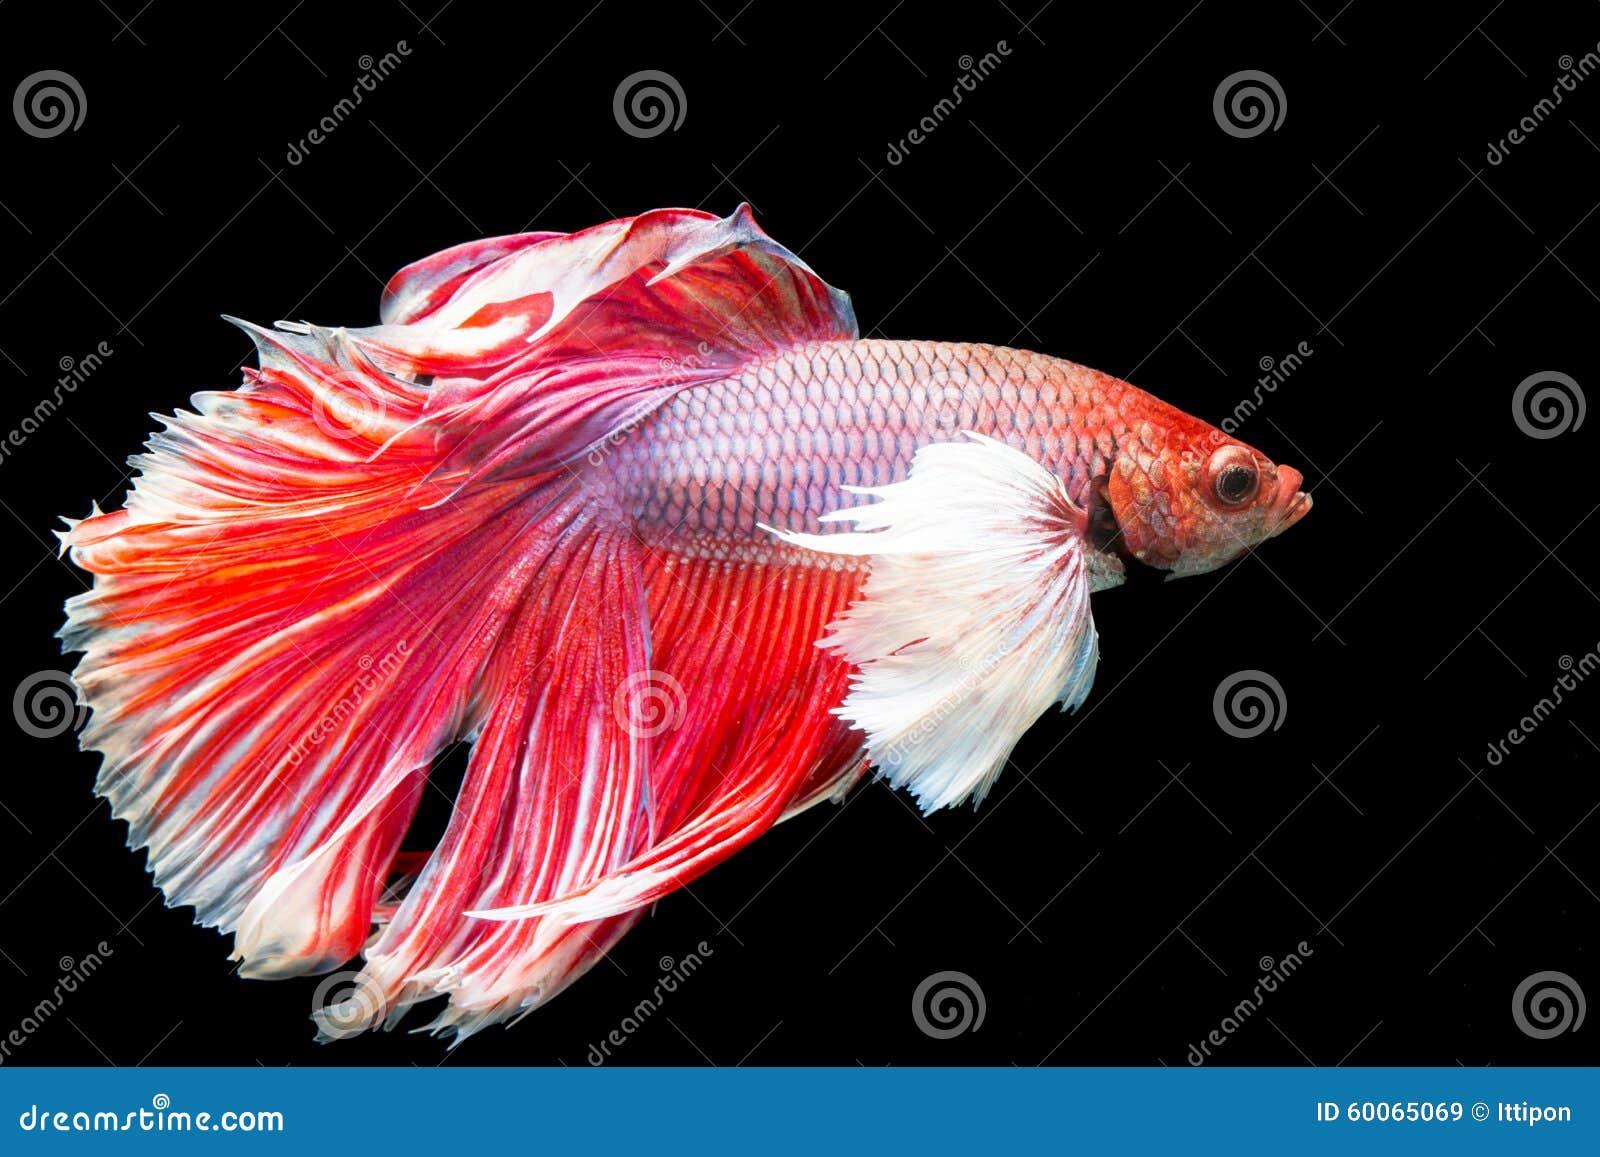 Beautiful of red tail siamese betta fighting fish stock for Red betta fish